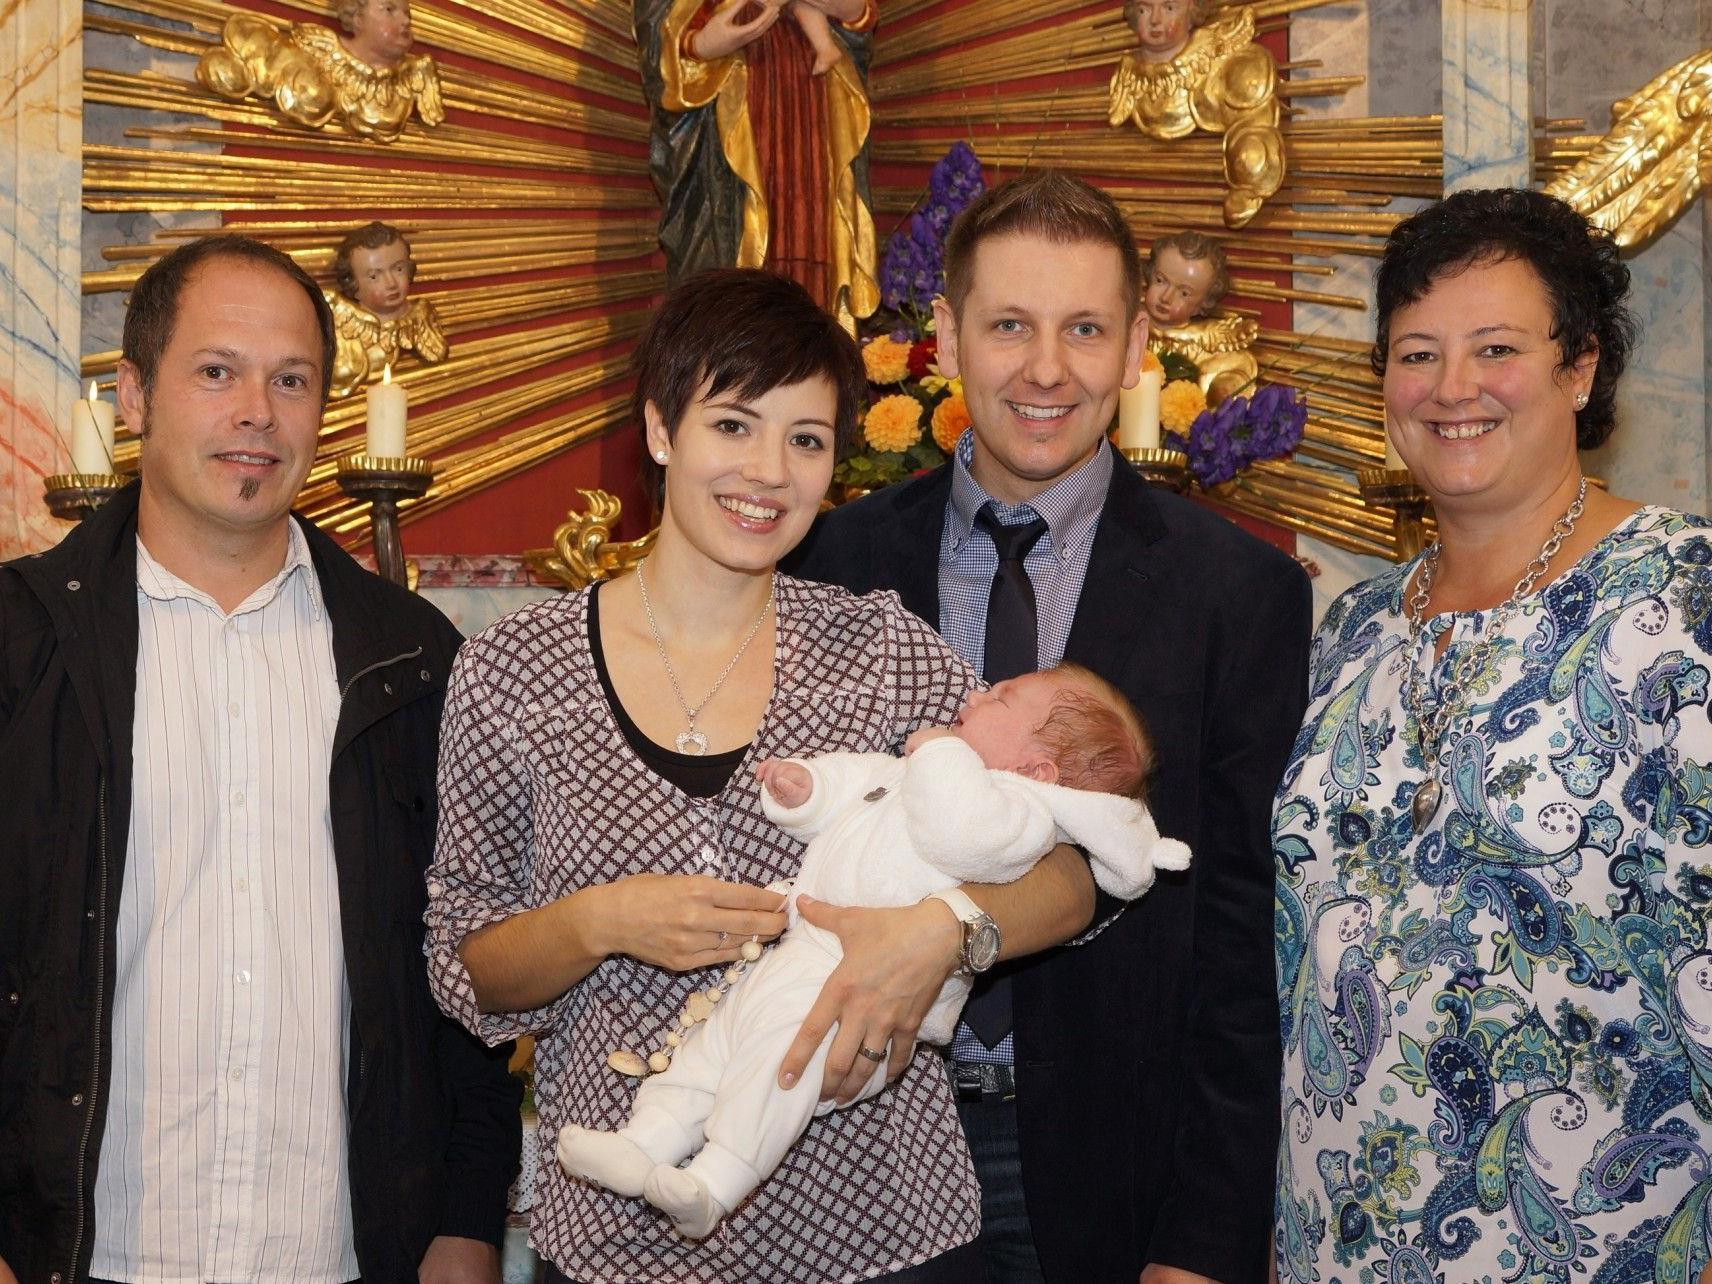 Taufe von Paul Valentin Baur, Loretokapelle am 7.10.12